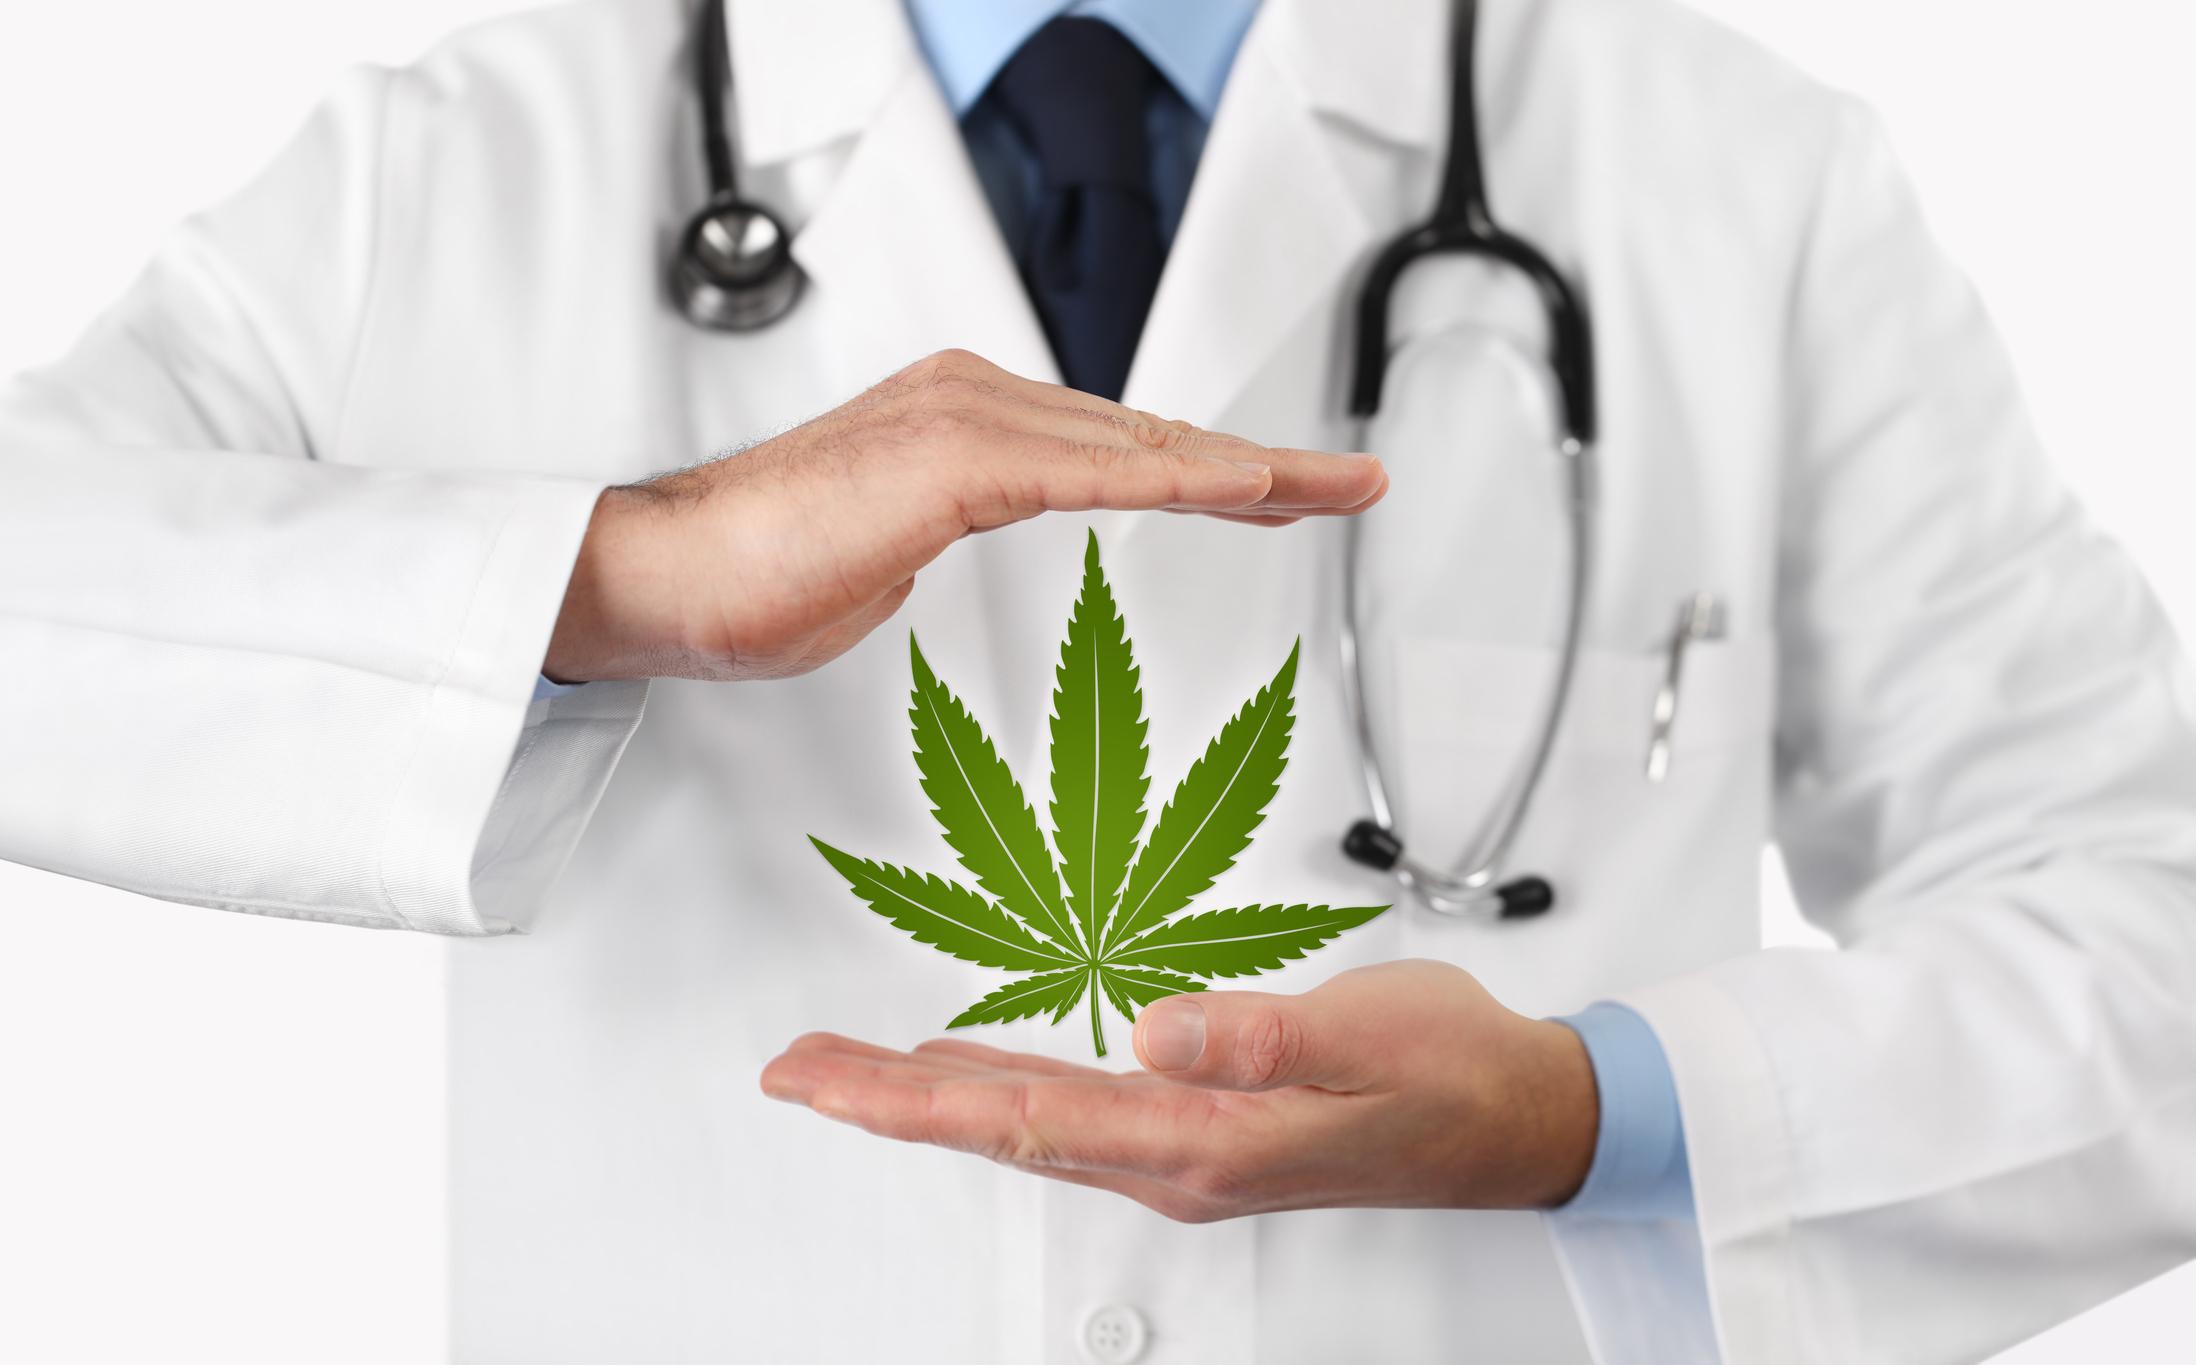 Doctor holding Marijuana Cannabis Pot Weed Leaf Medical Getty